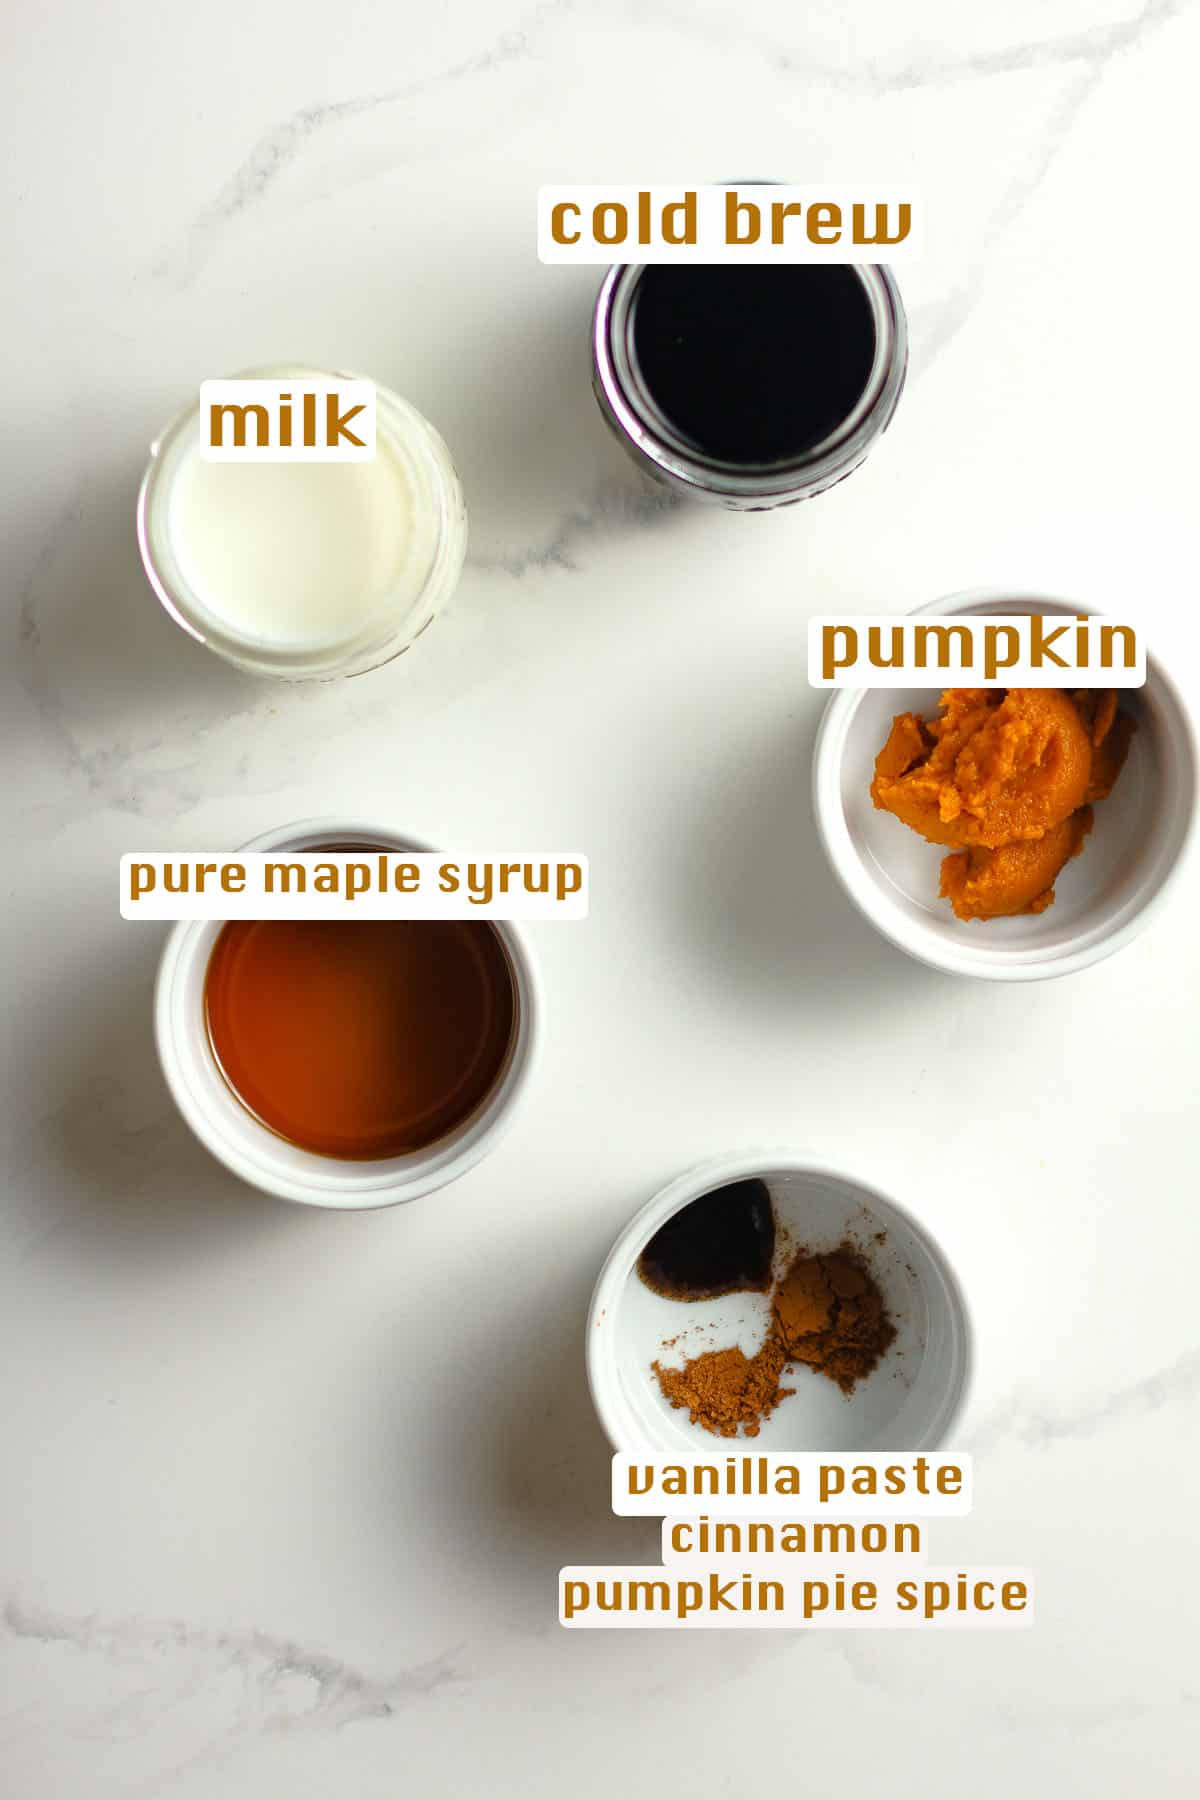 The pumpkin cold brew ingredients.